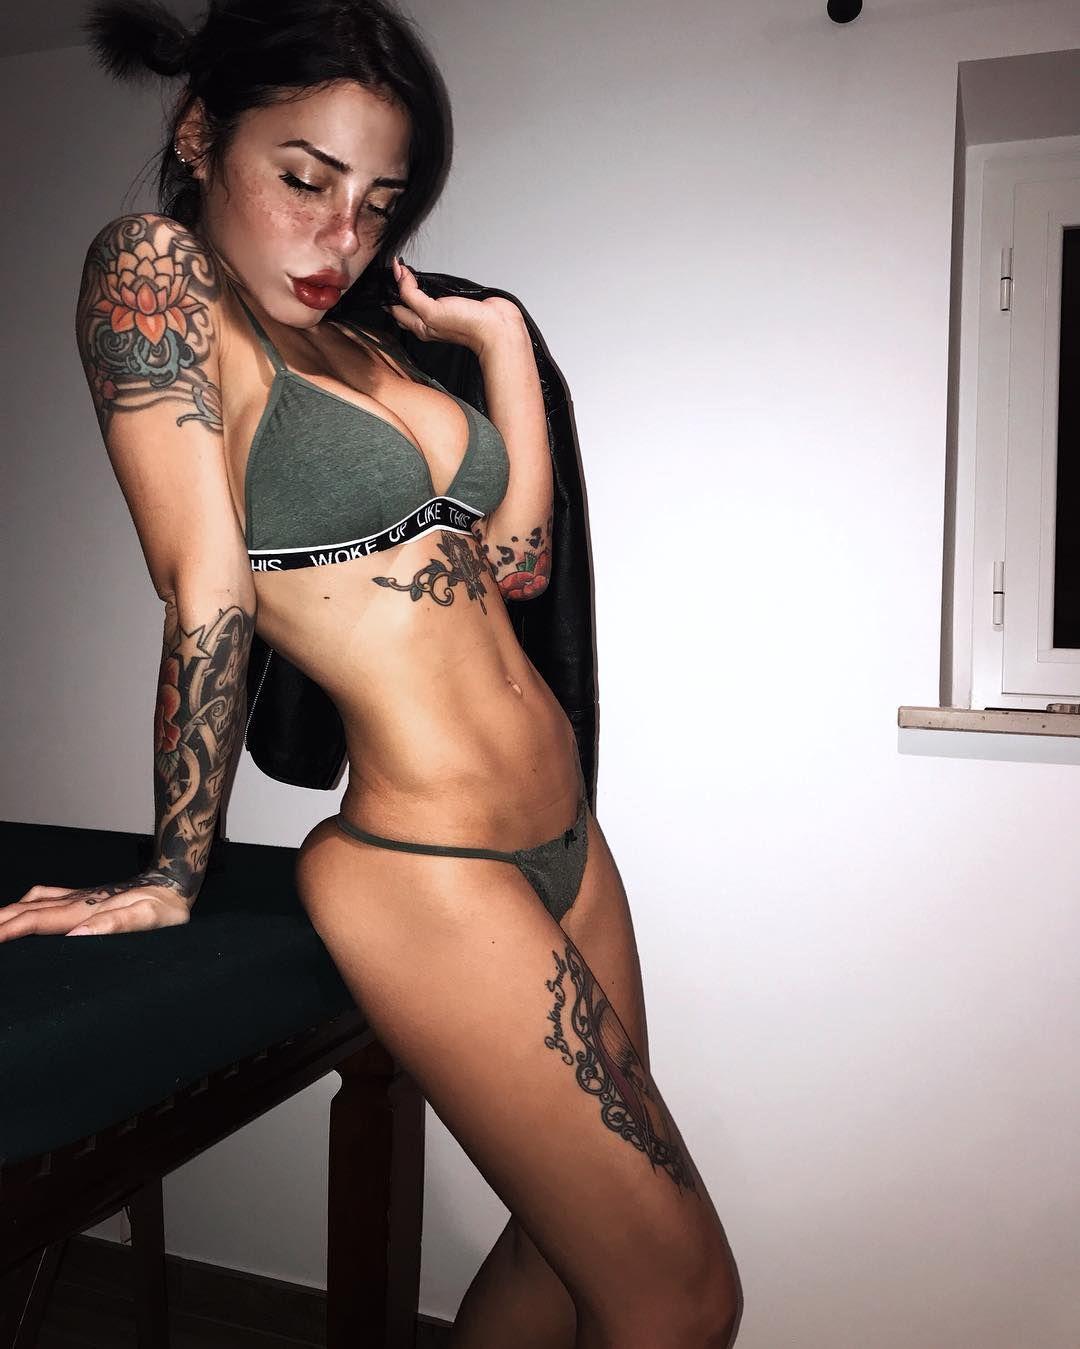 Alexis mucci